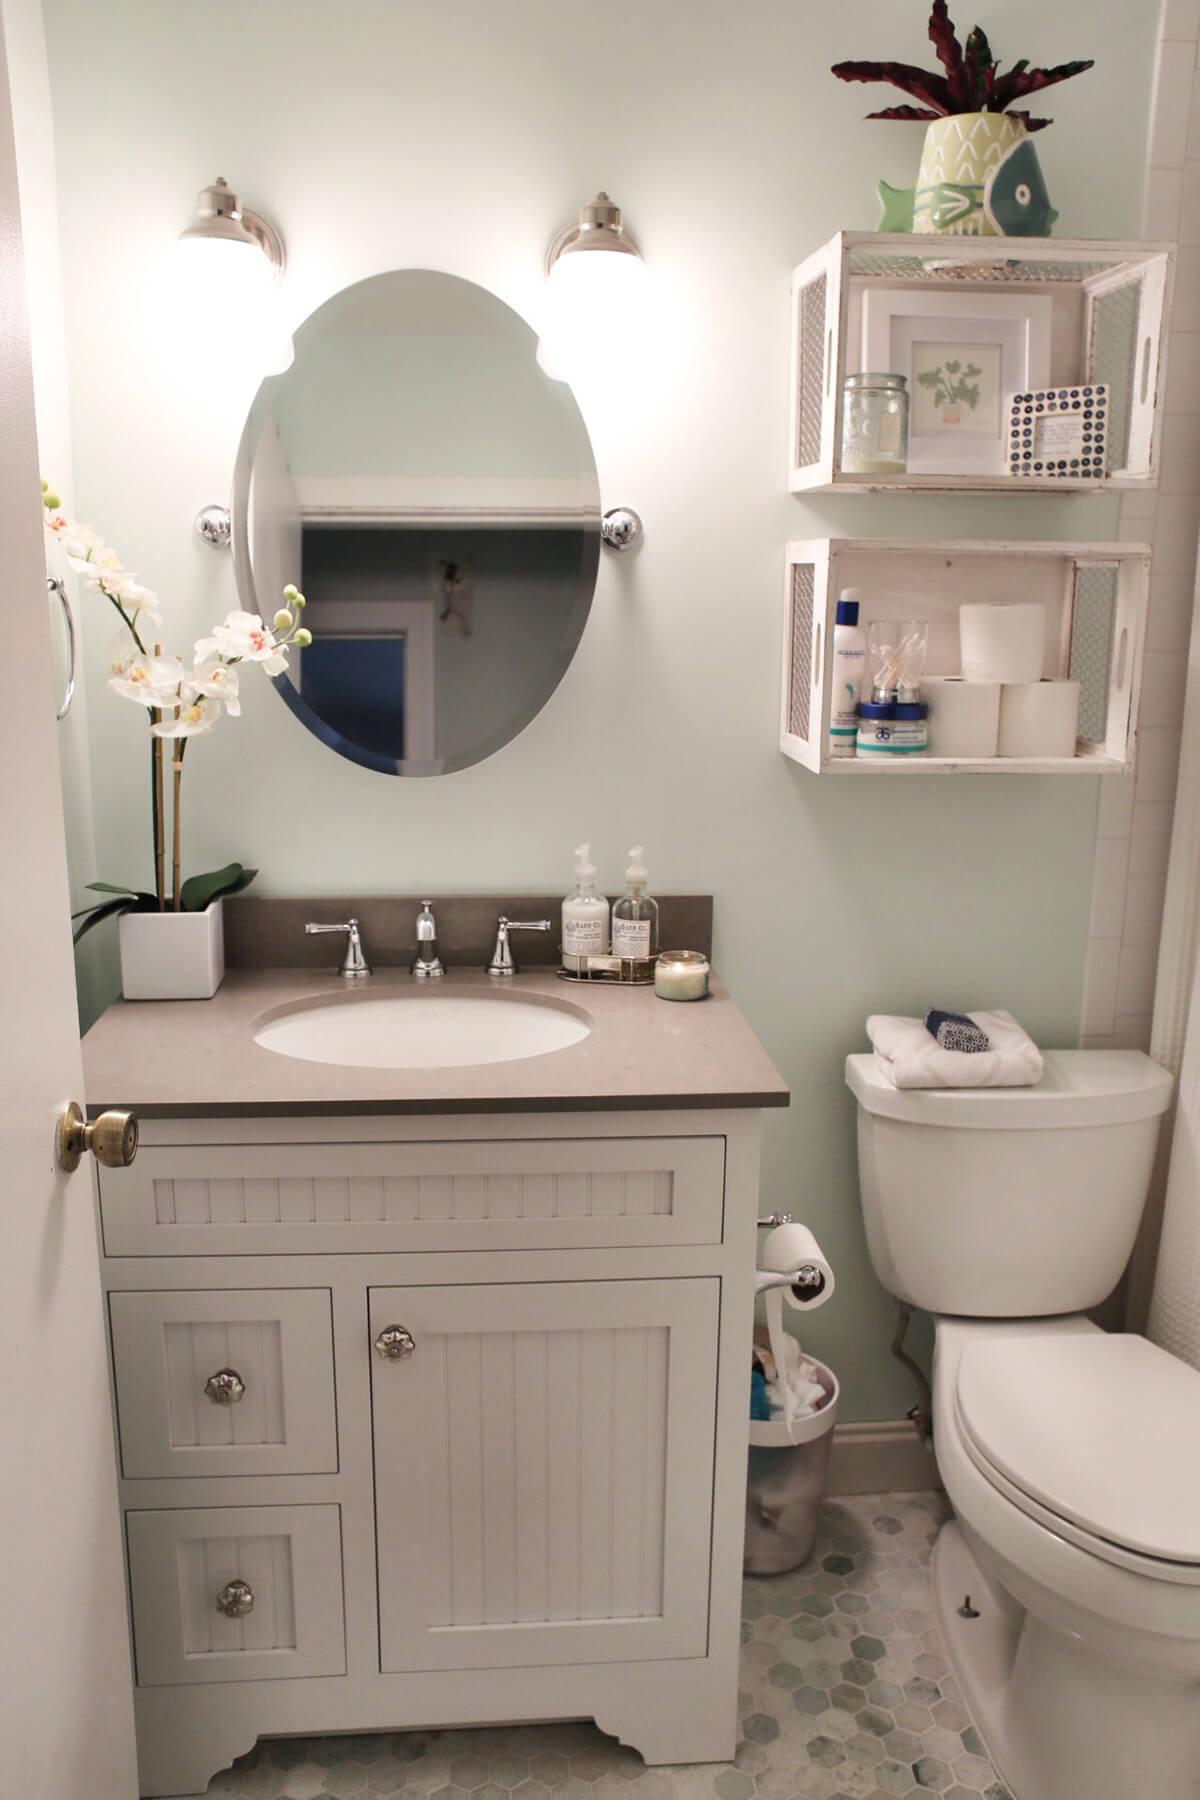 Repurposed Wood Crate Bathroom Shelves